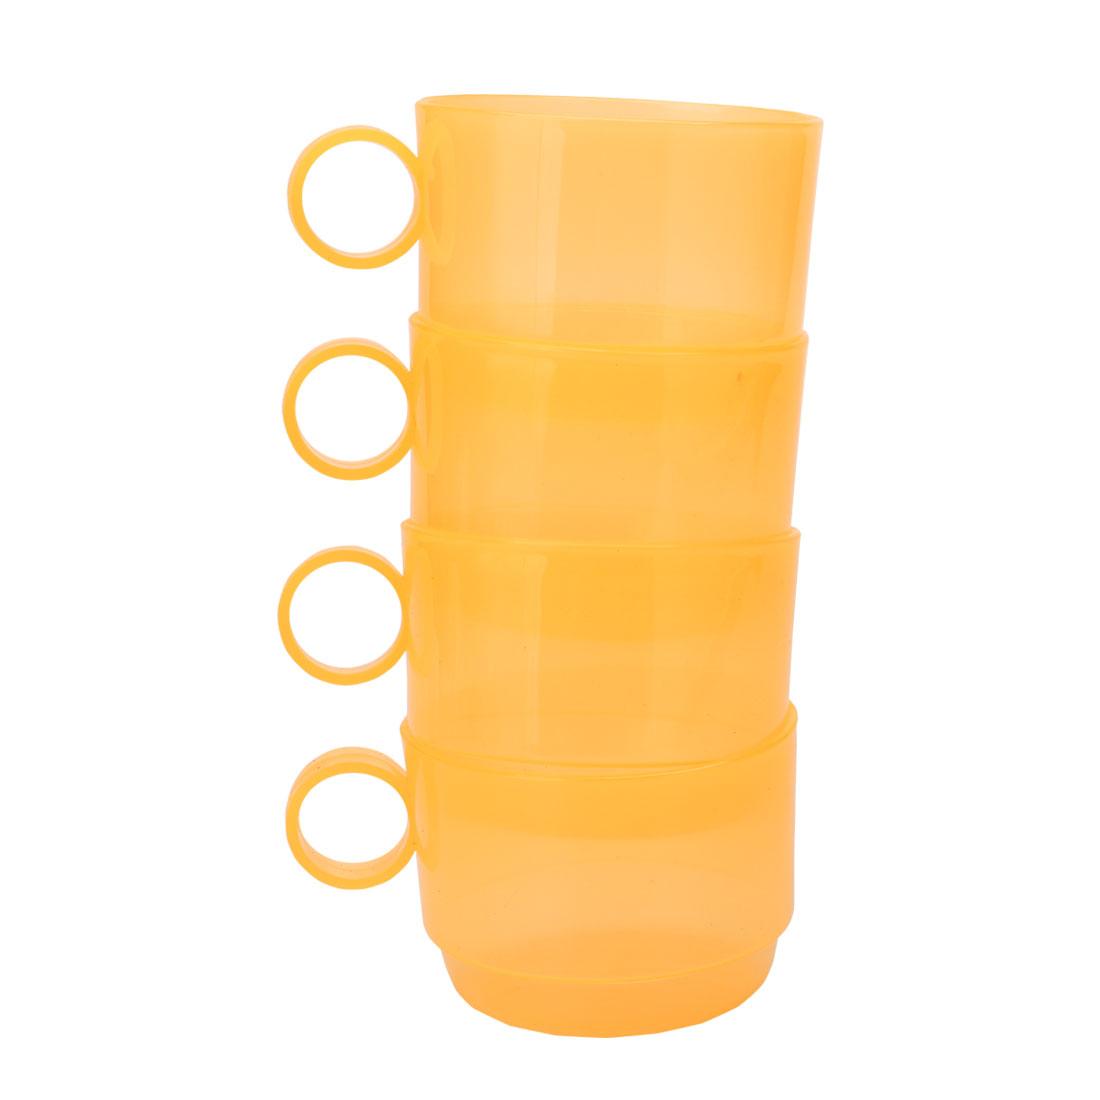 Home Cafe Plastic Circle Handle Portable Water Tea Milk Coffee Storage Drinking Cup Mug Yellow 4pcs